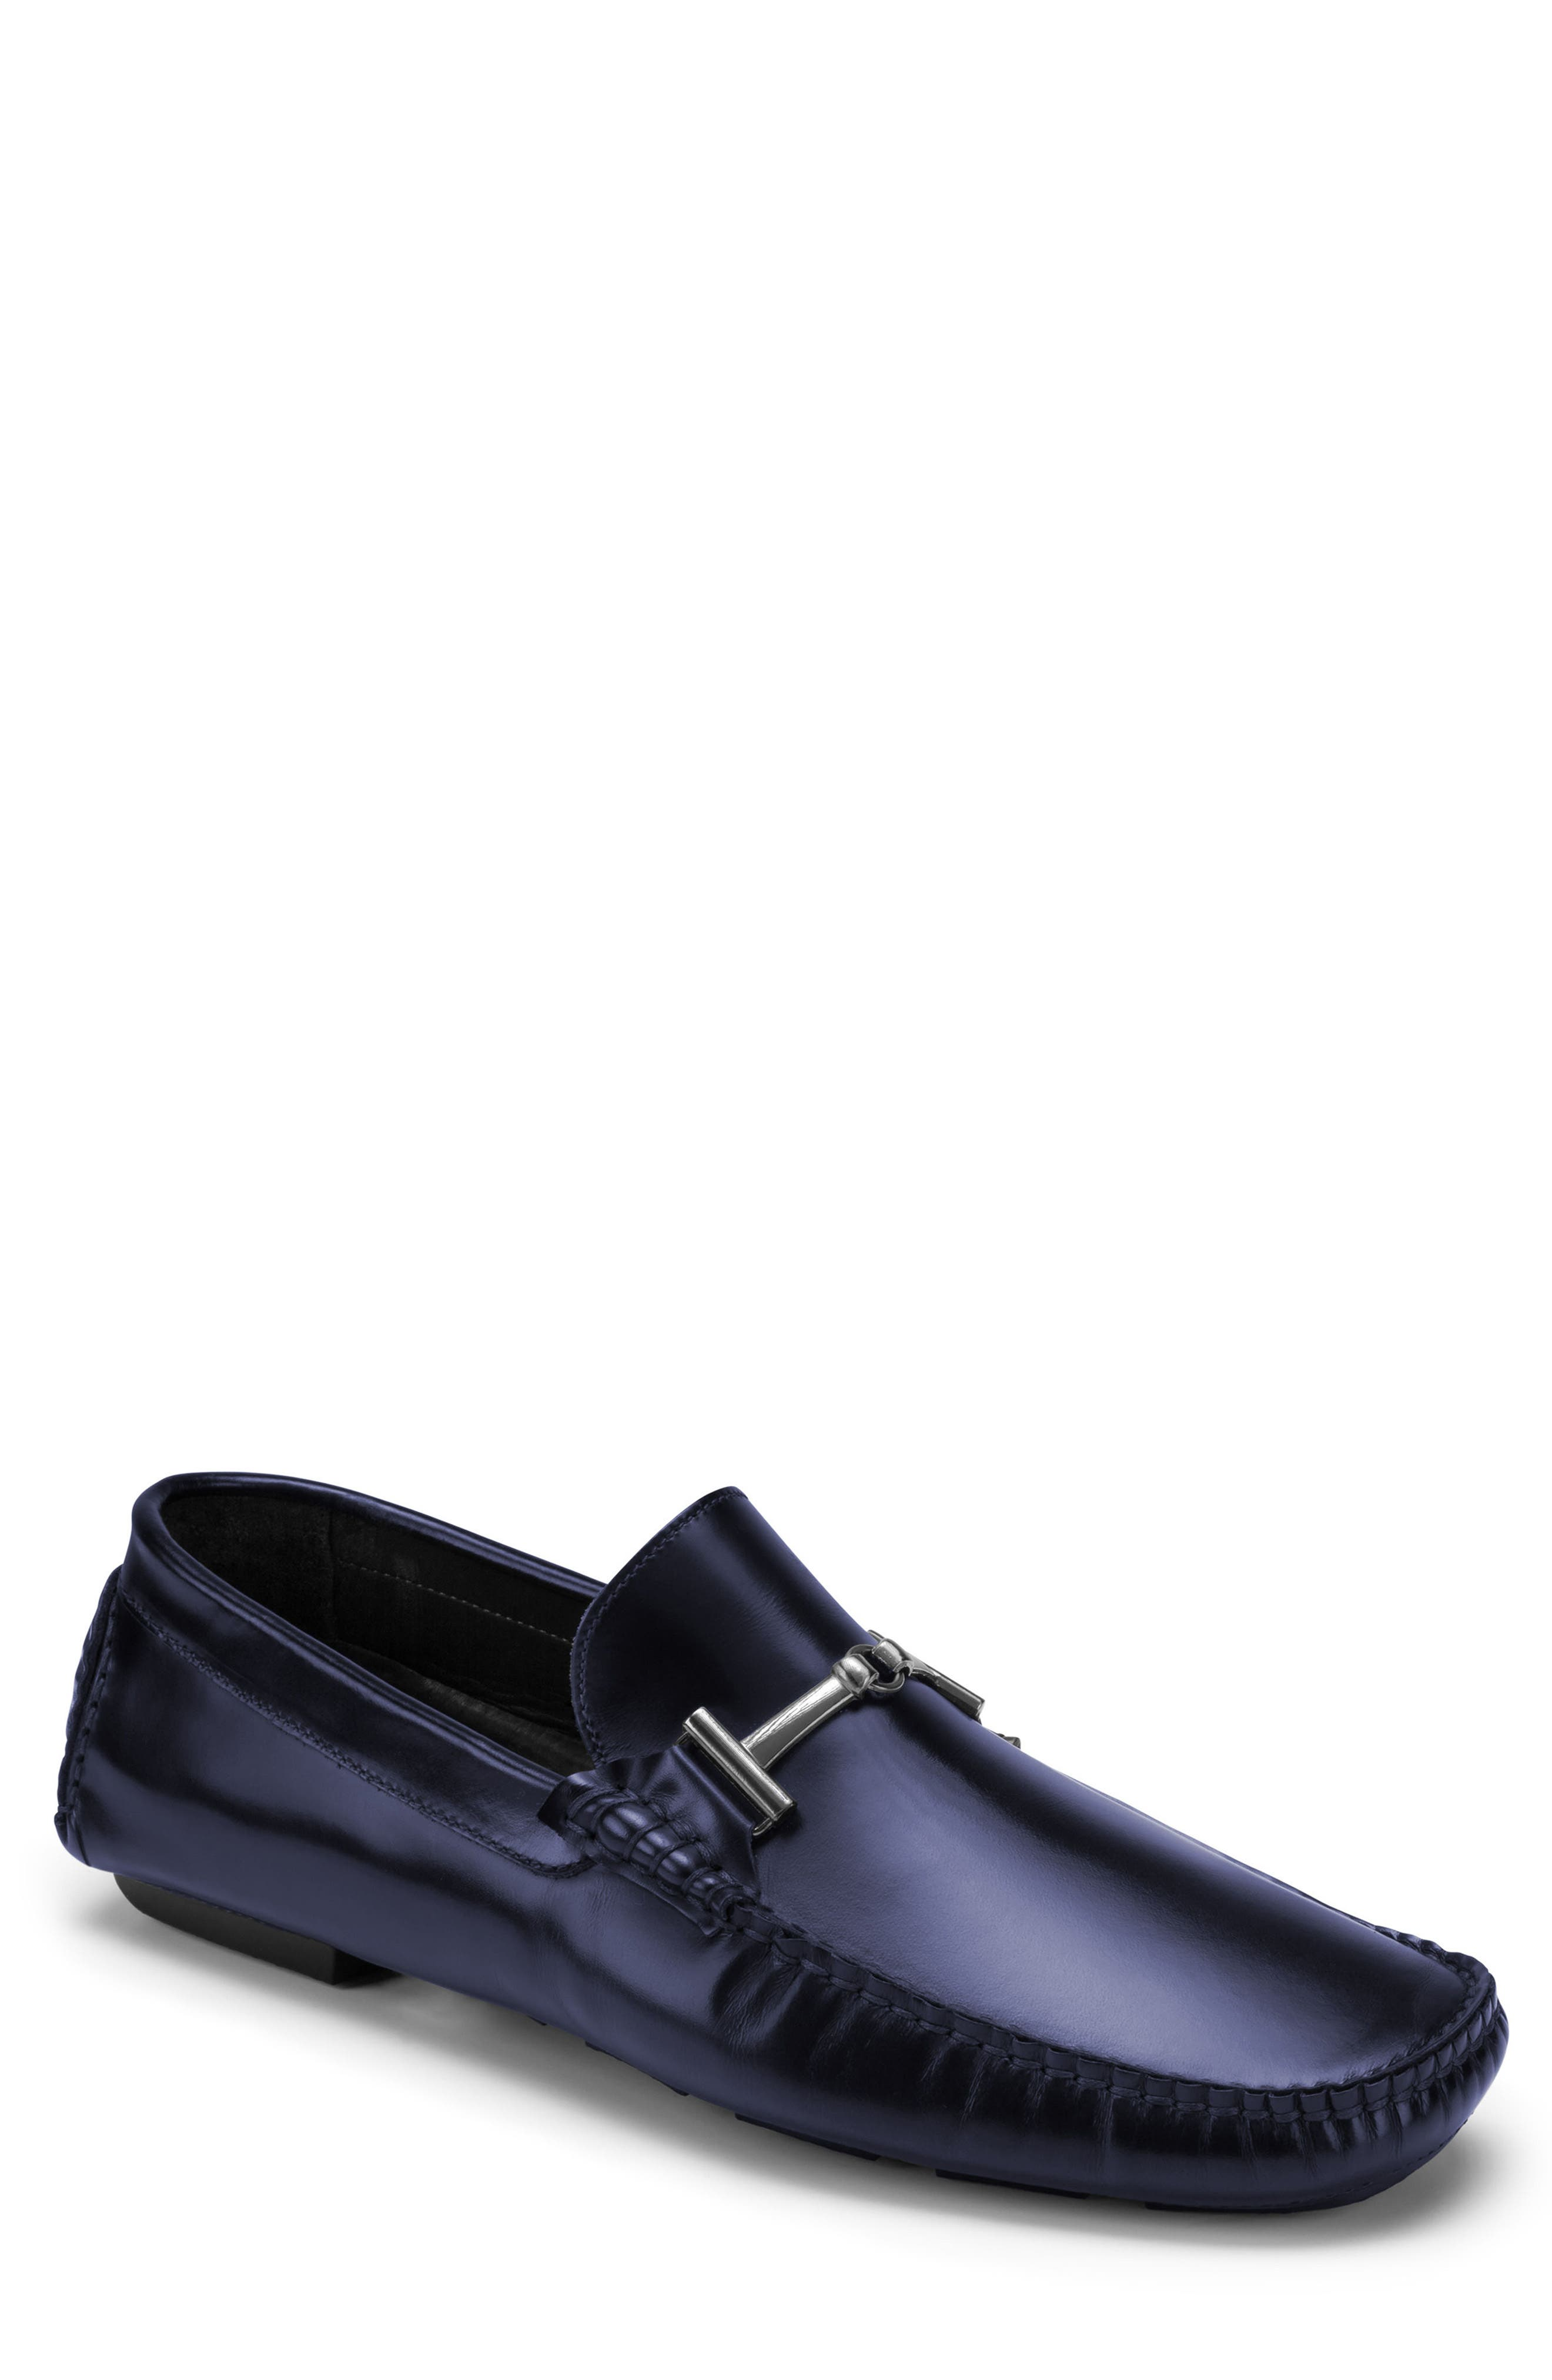 Main Image - Bugatchi St. Tropez Driving Shoe (Men)